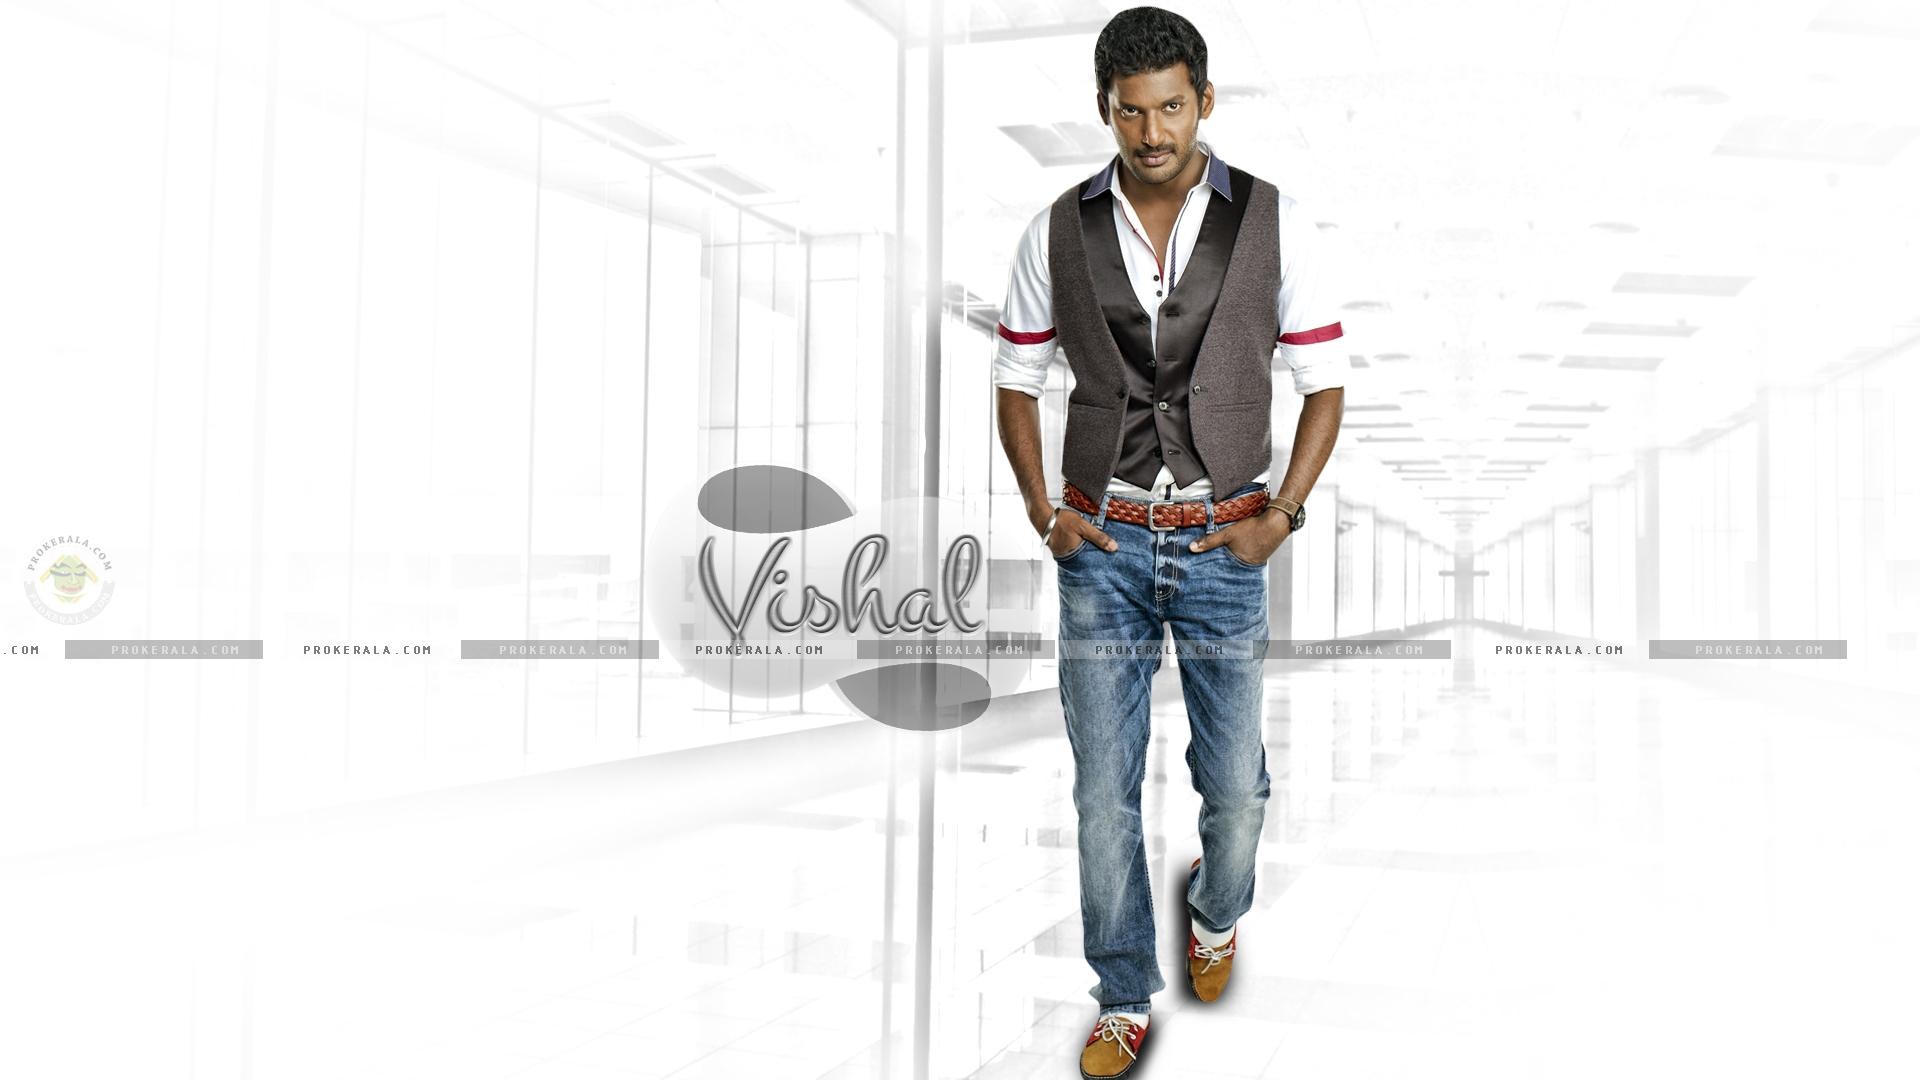 Vishal Hd Wallpapers